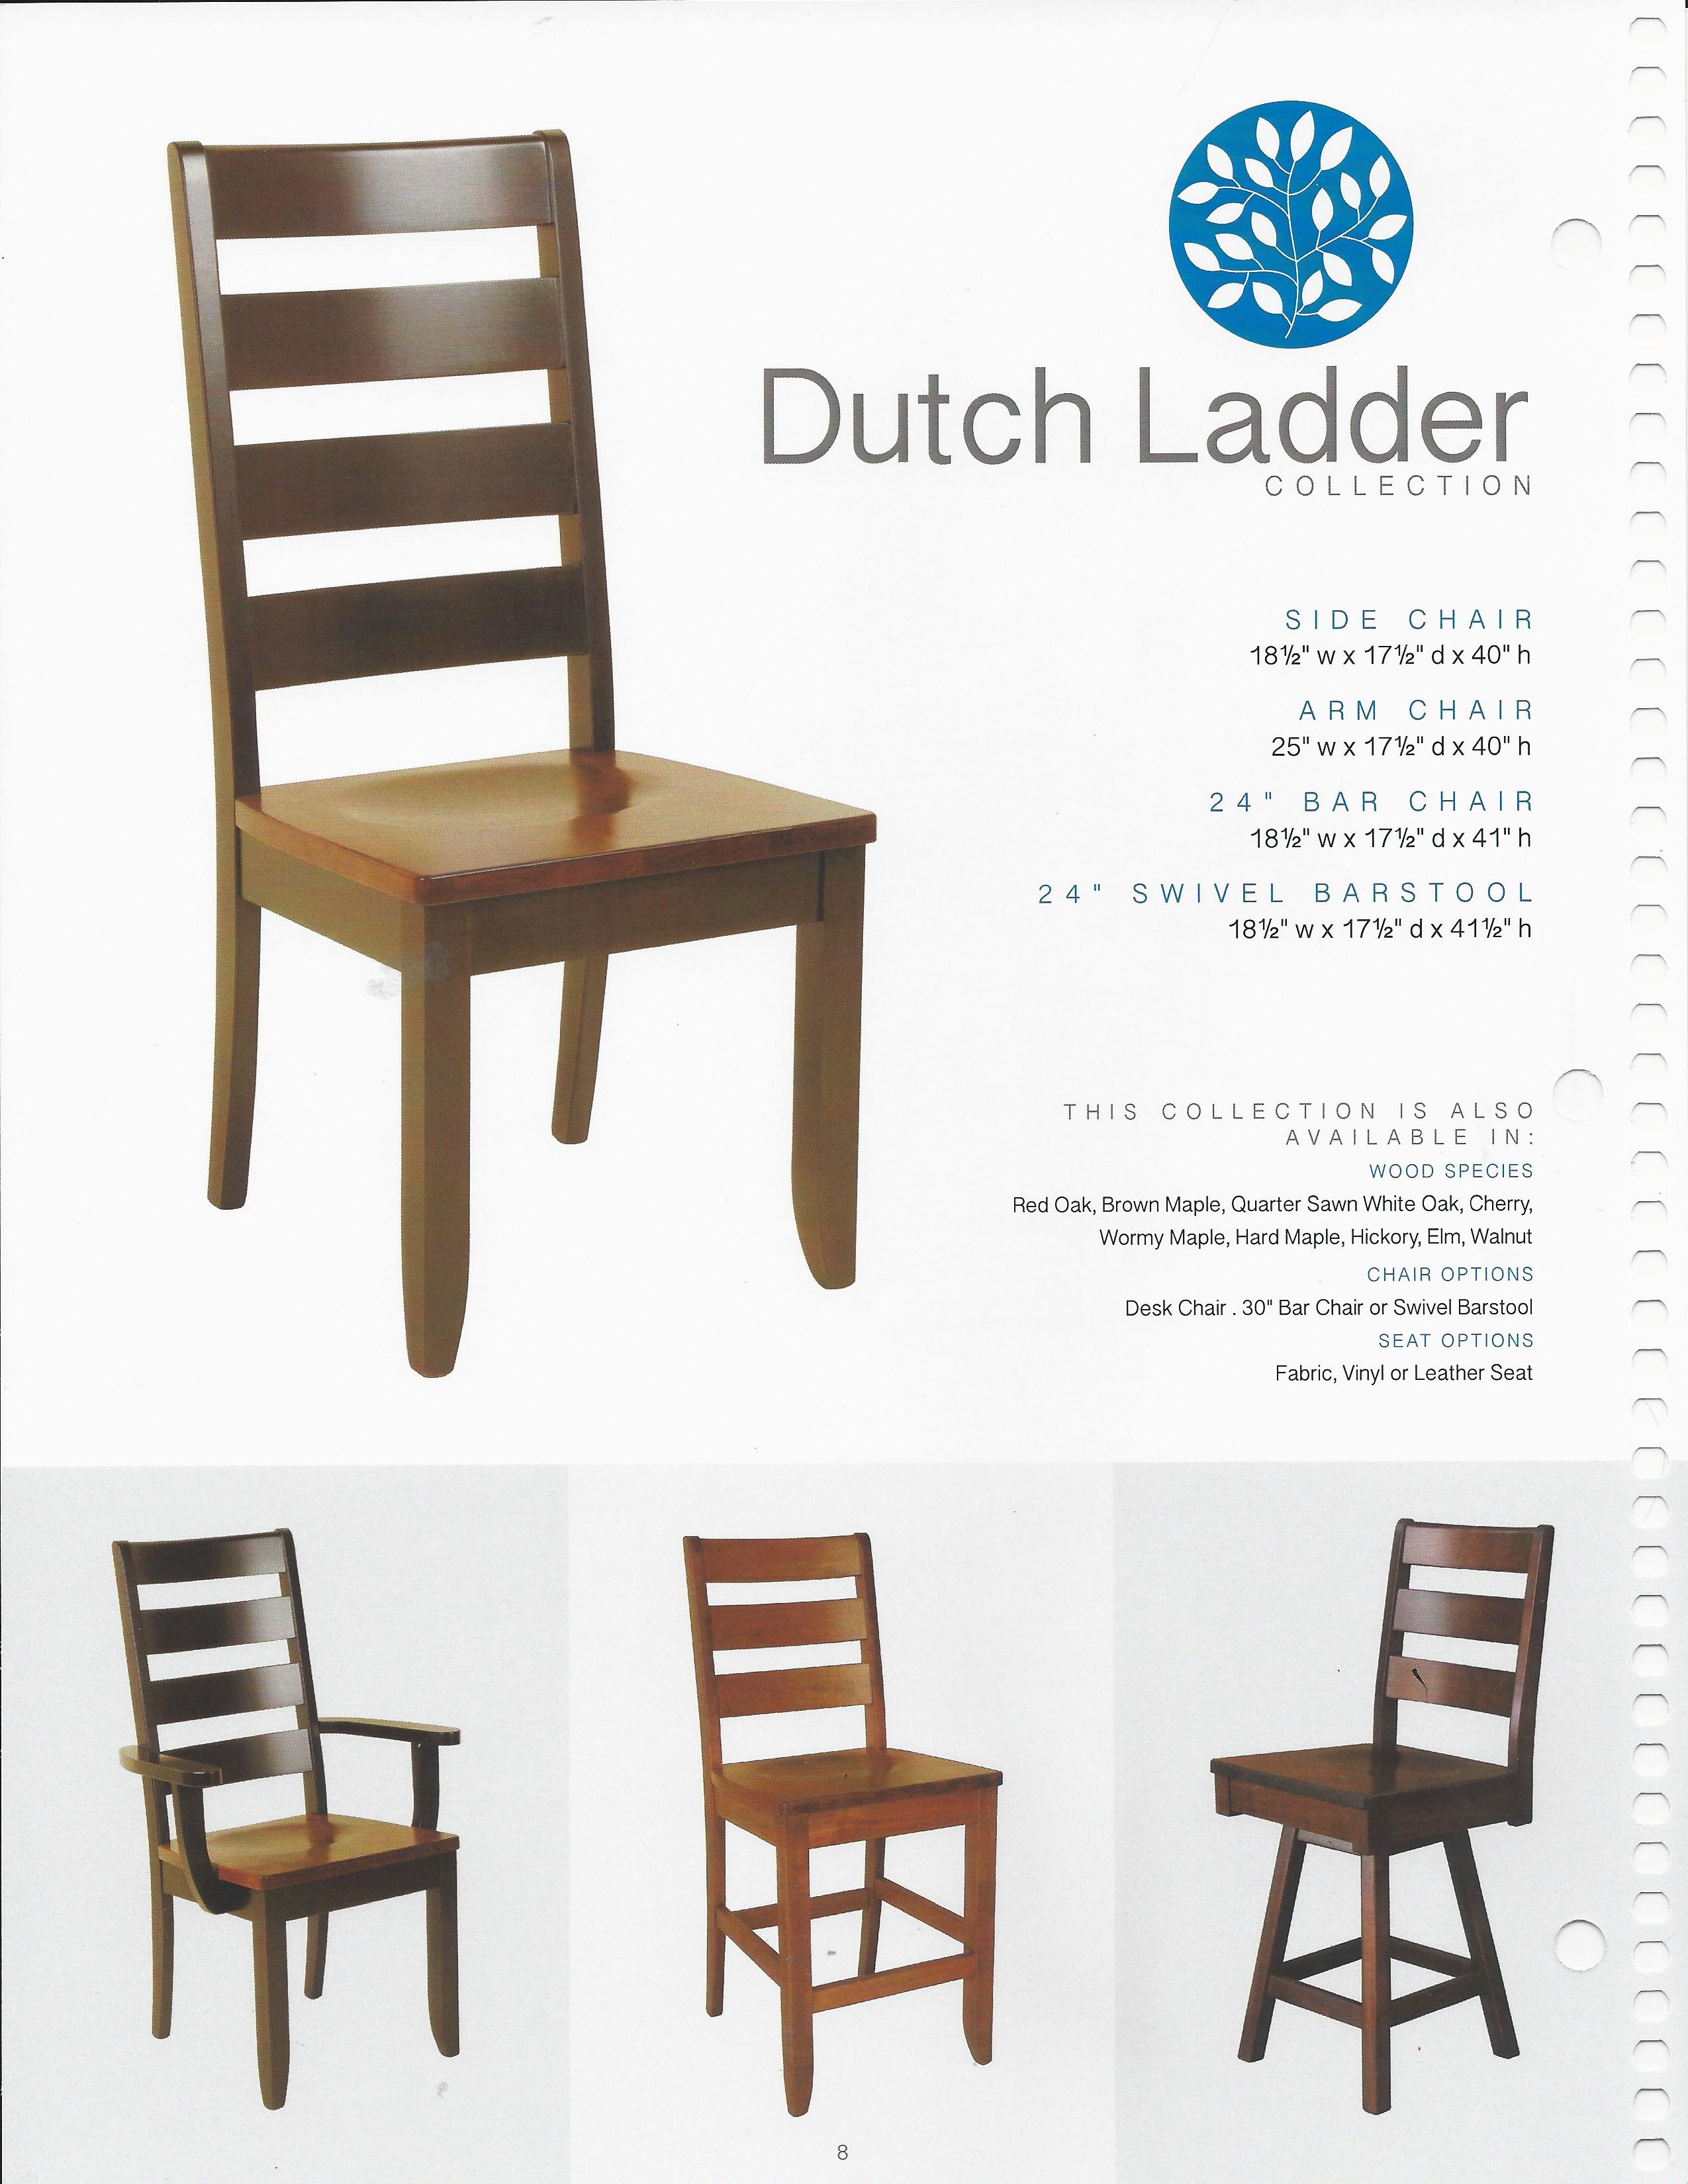 Dutch Ladder